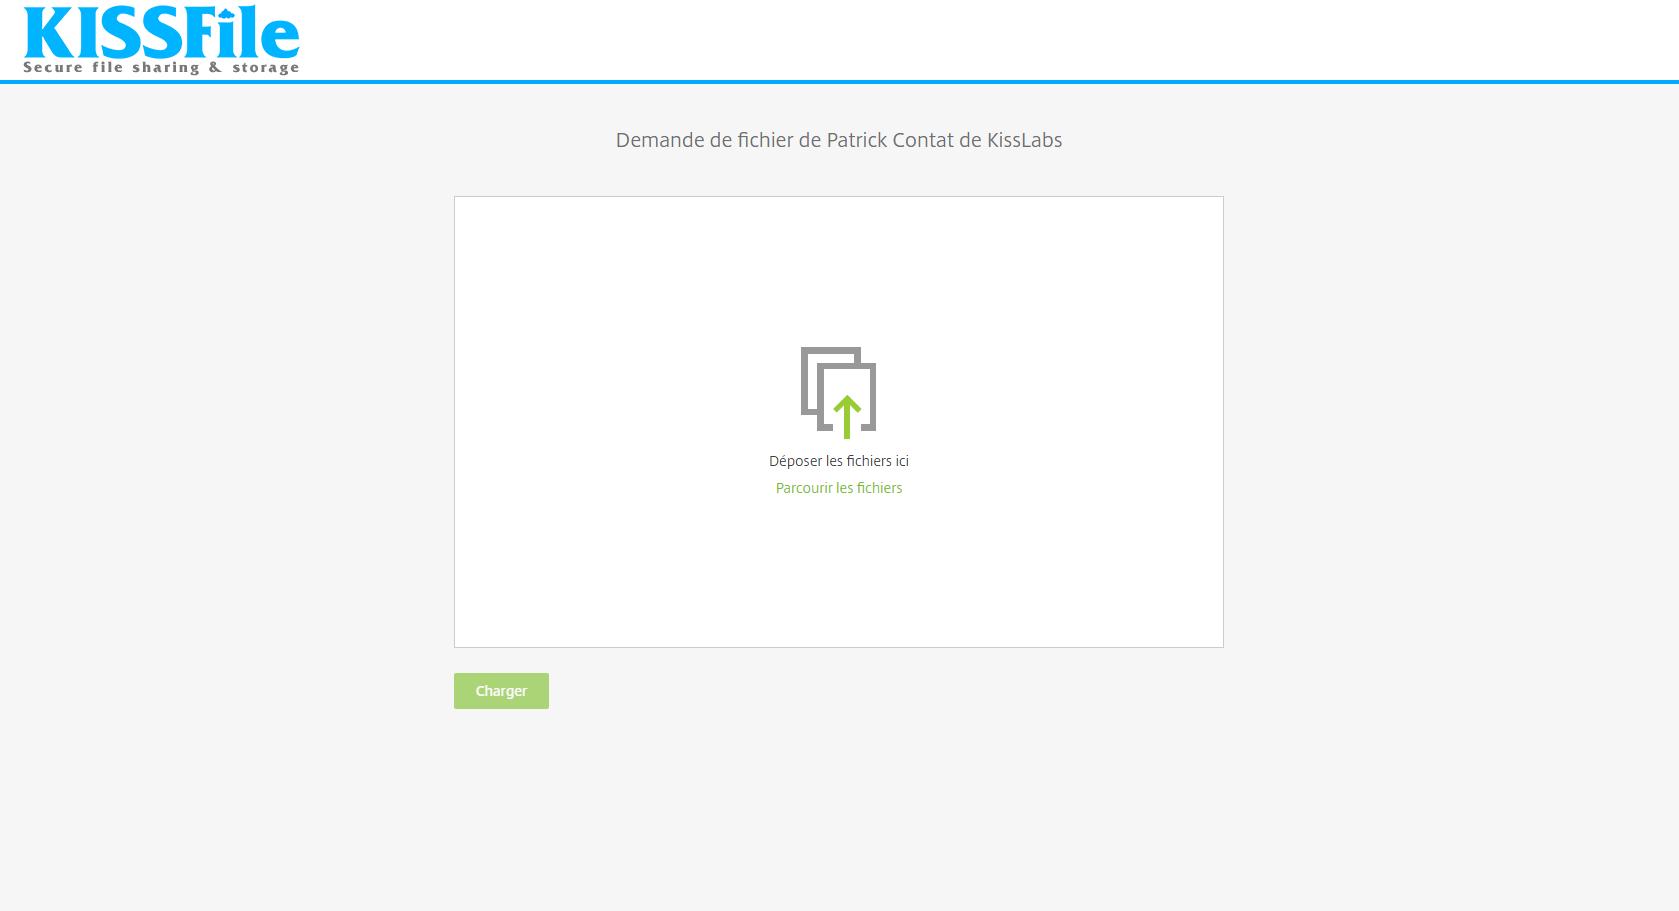 KissFile - Citrix ShareFile - Request files via Outlook - Upload